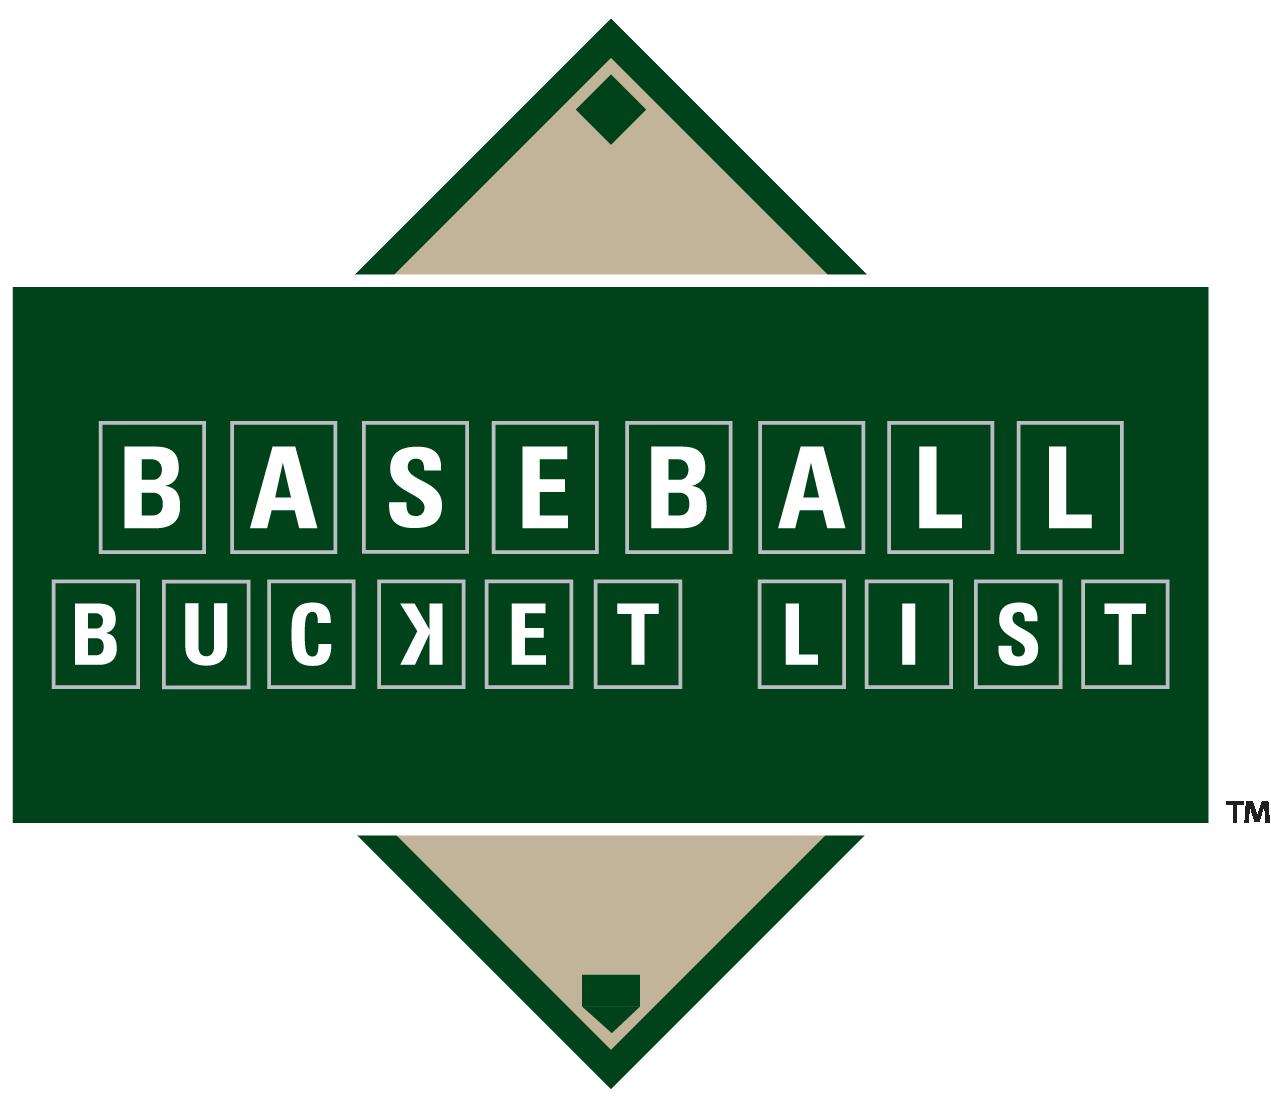 Baseball Bucket List Logo